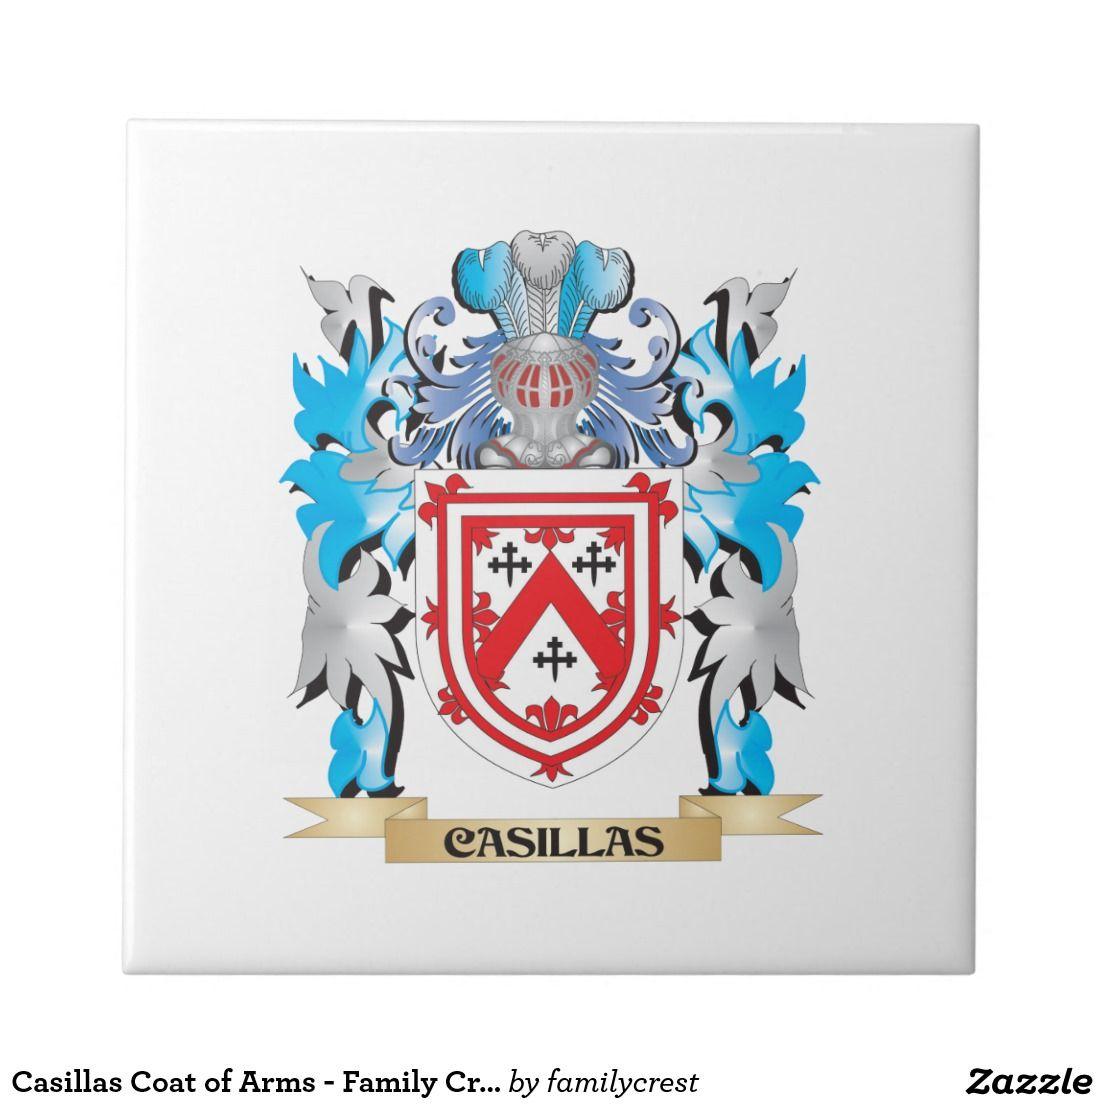 Casillas coat of arms family crest ceramic tile arms casillas coat of arms family crest ceramic tile biocorpaavc